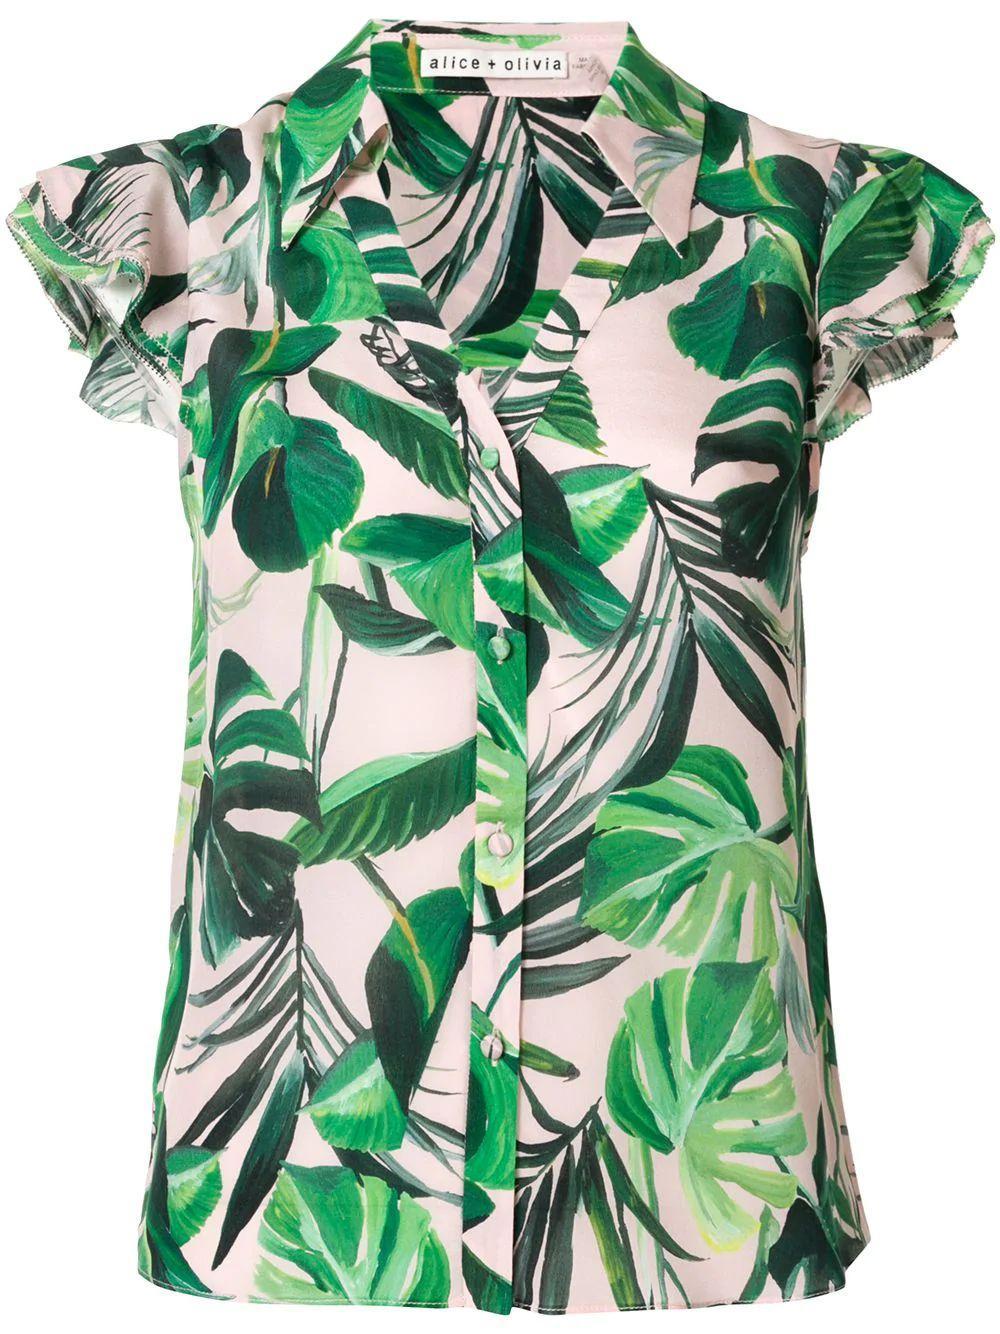 Randa Palm Print Top Item # CC005P58002